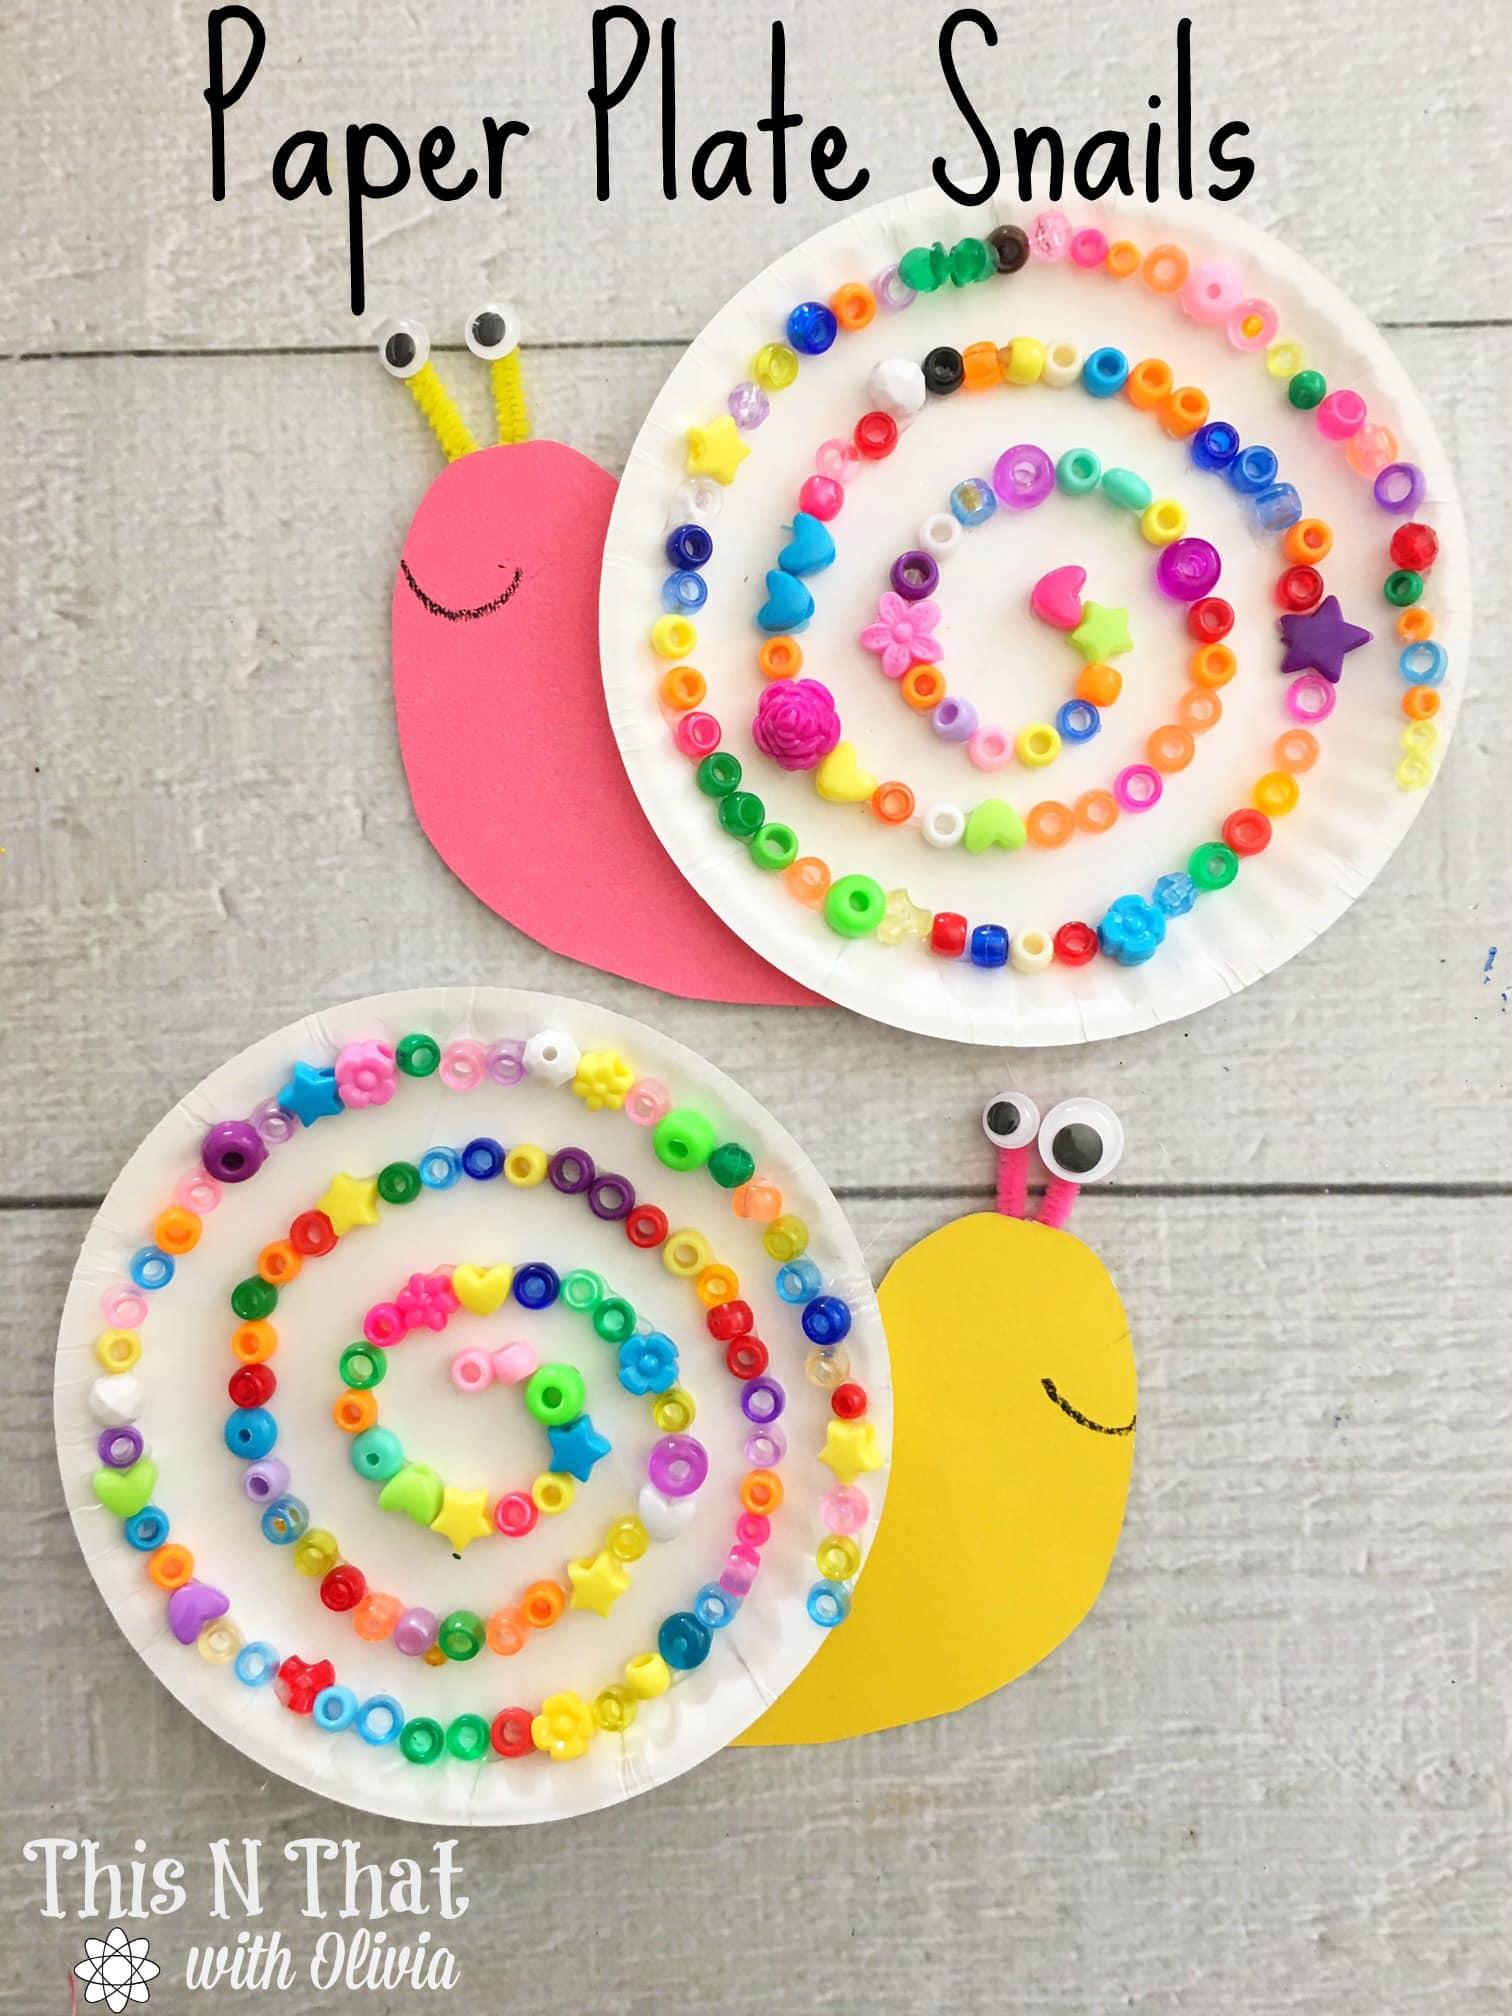 Paper Plate Snails Craft for Kids #Snail #Craft #DIY #Kids